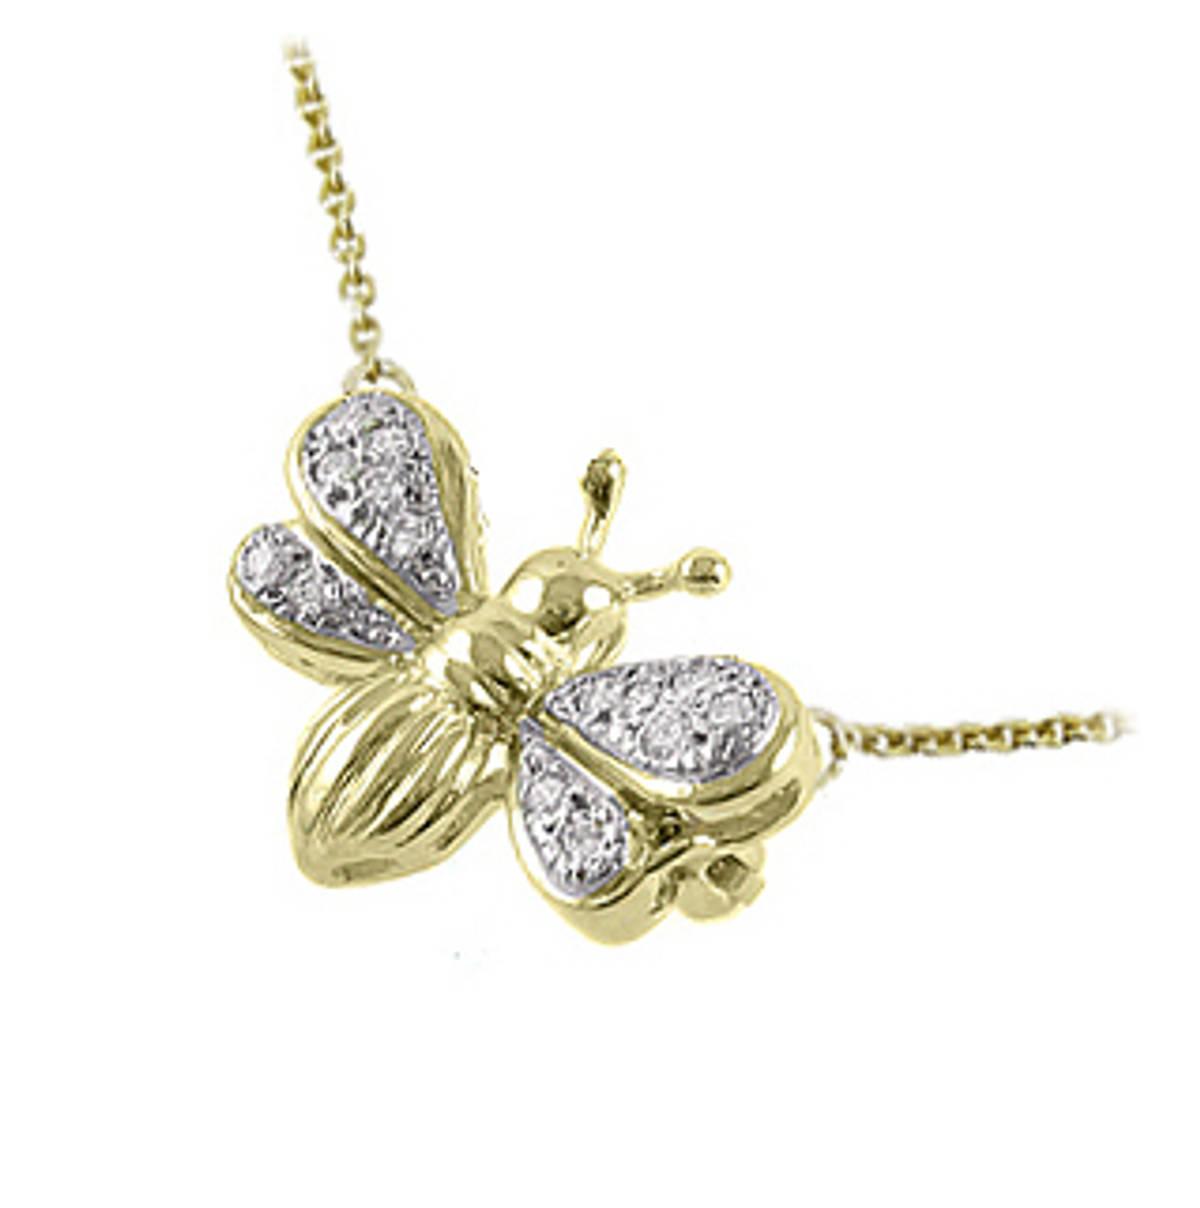 "9k yellow gold brilliant cut diamond bee pendant on chainDETAILSCarat: total diamond weight 0.08cts9k yellow gold 18"" chain SIZE & FITPendant length 1.8cmPendant width 1.9cm"